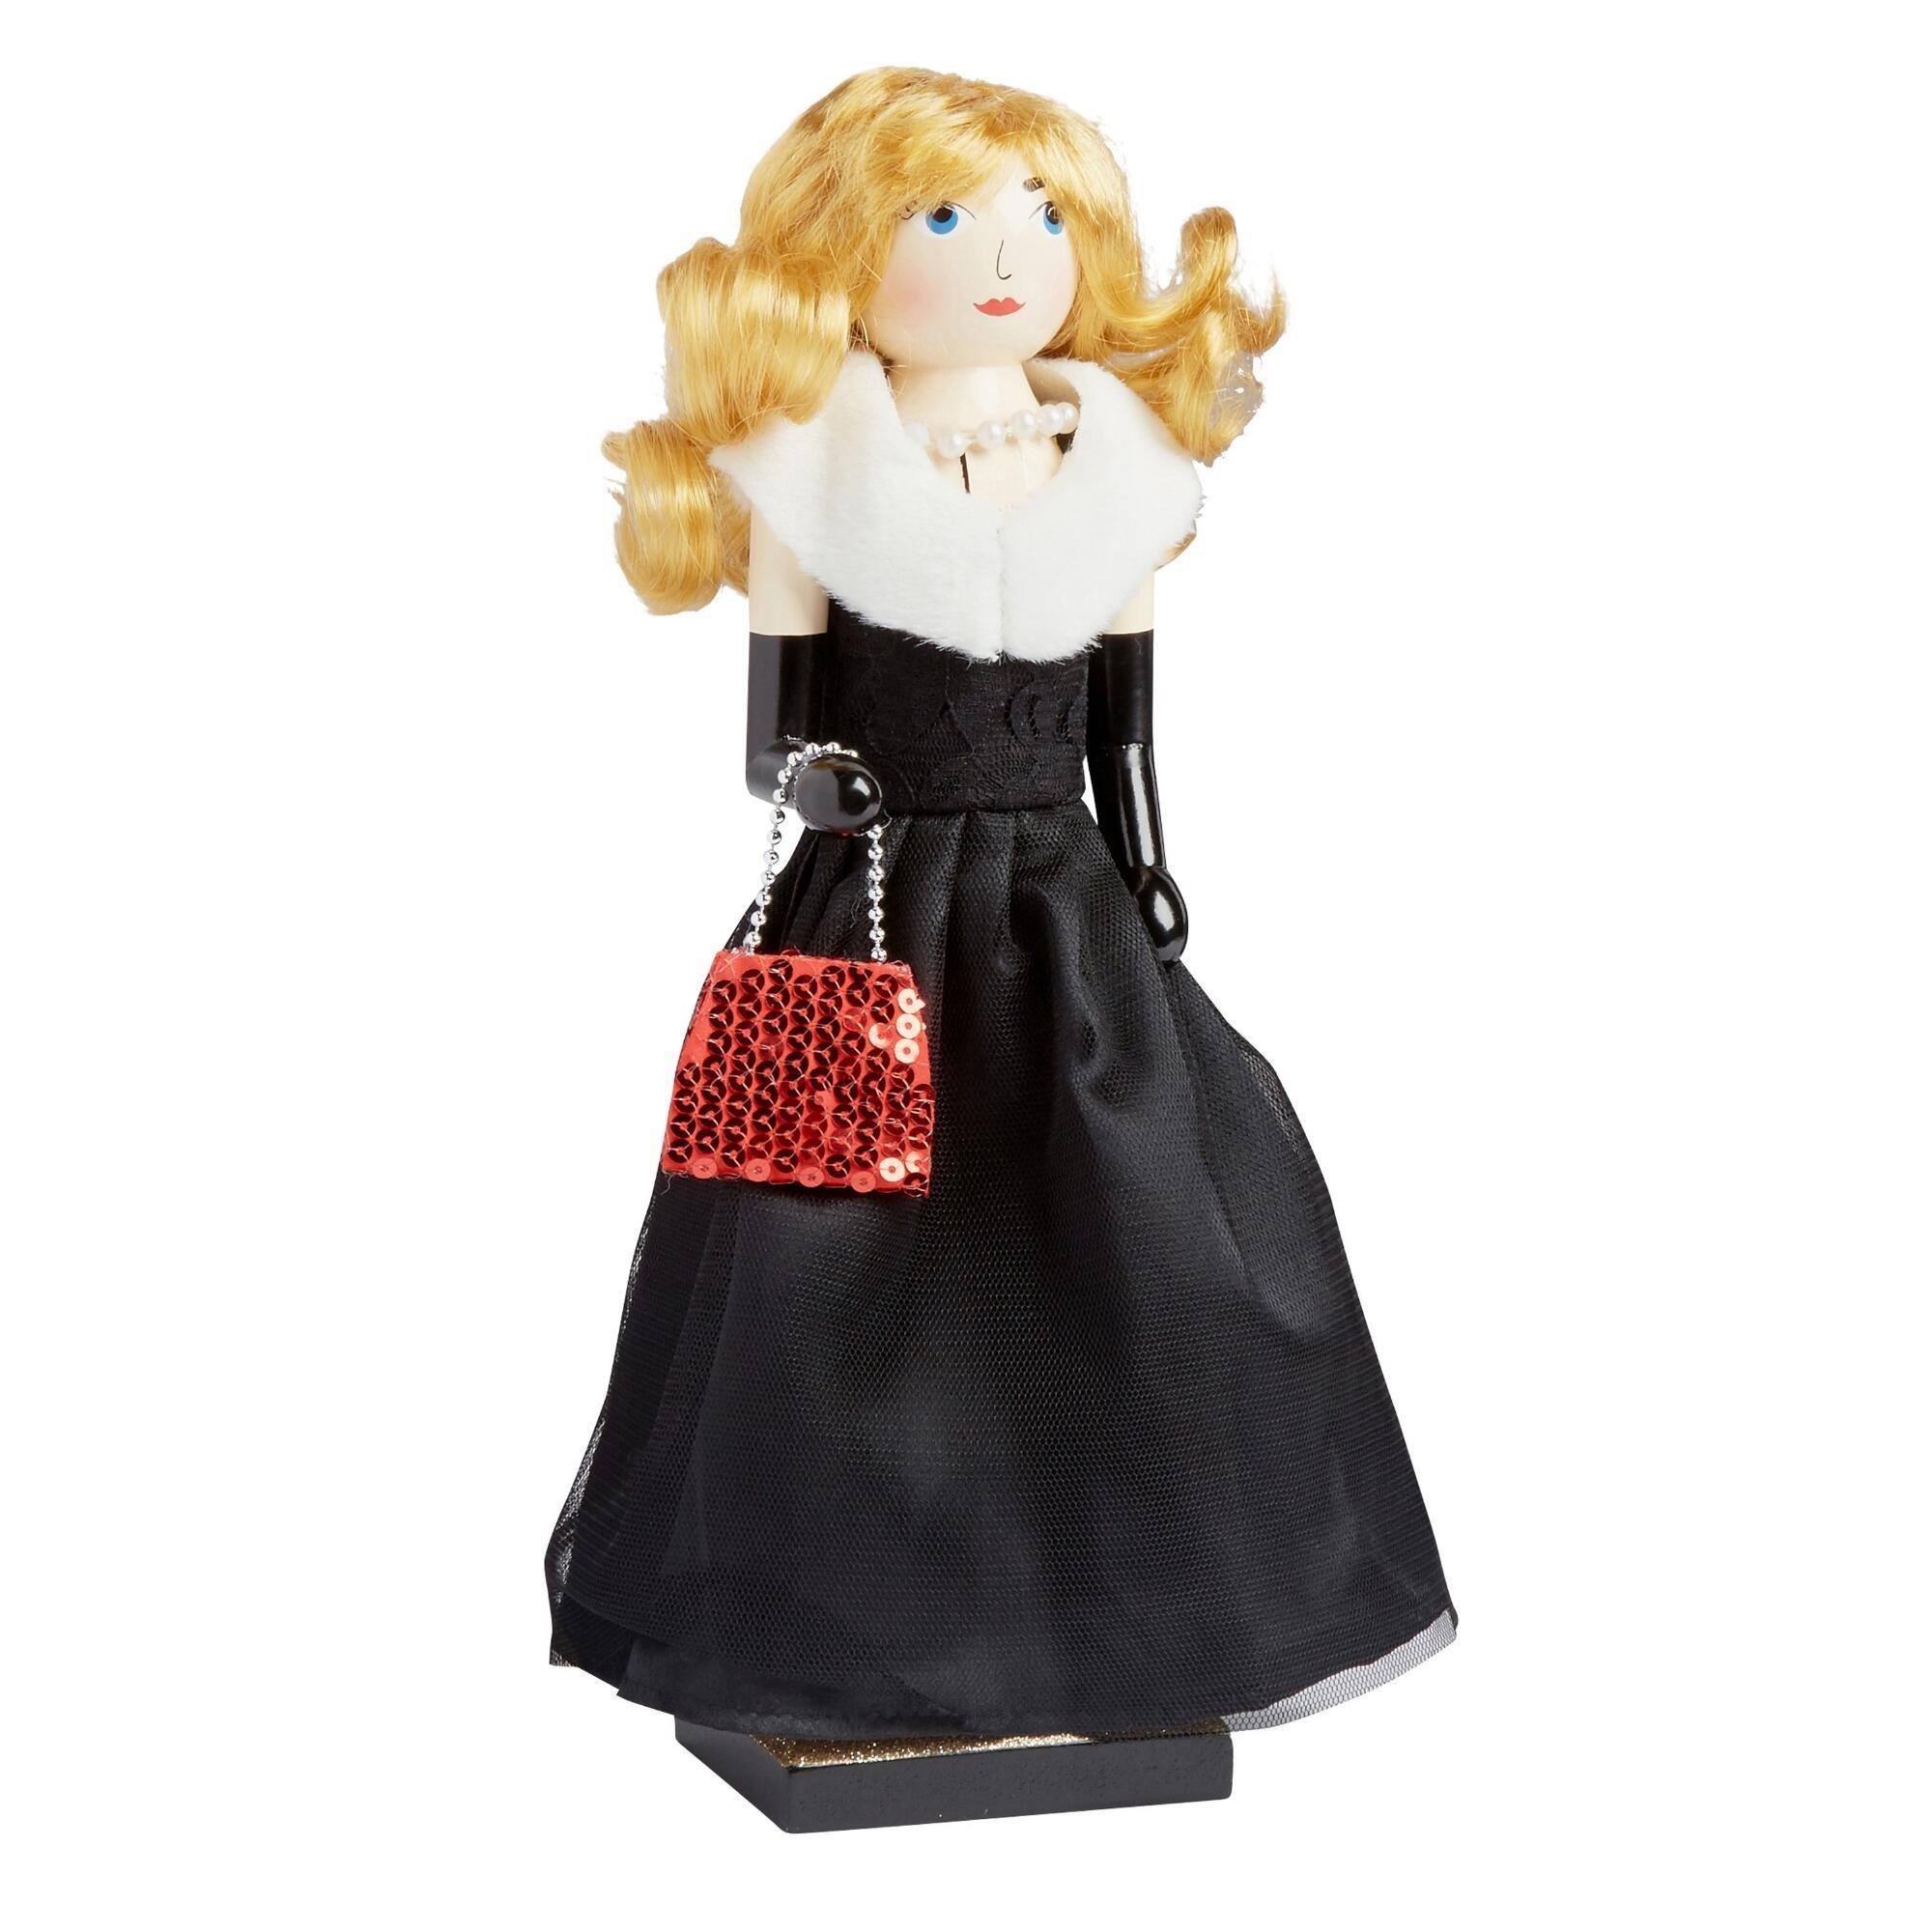 "14"" Glam Girl in Black Dress Nutcracker"